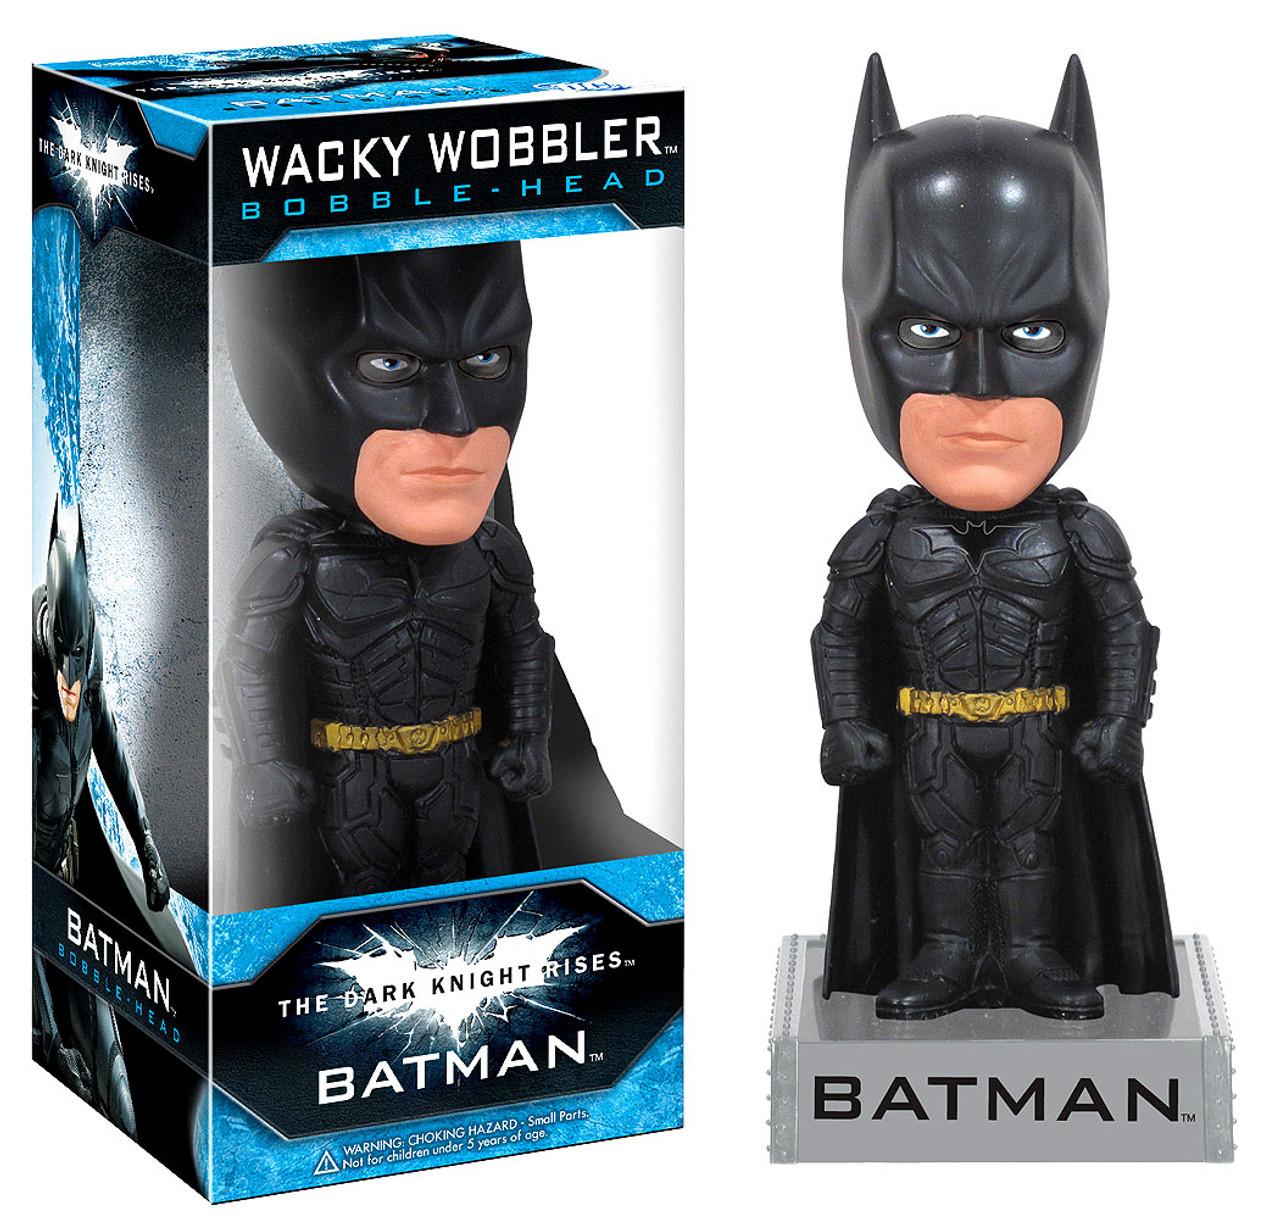 Funko The Dark Knight Rises Wacky Wobbler Batman Bobble Head [The Dark Knight Rises]